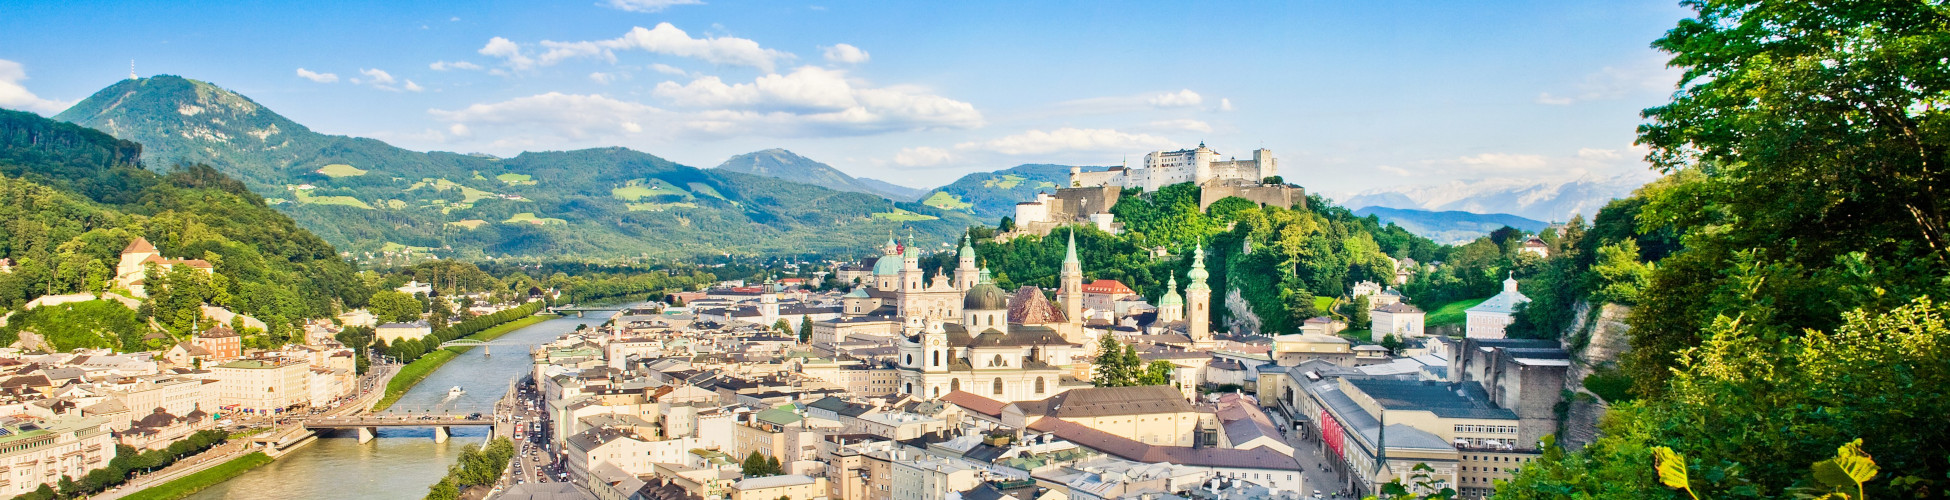 Panorama Salzburg_agb